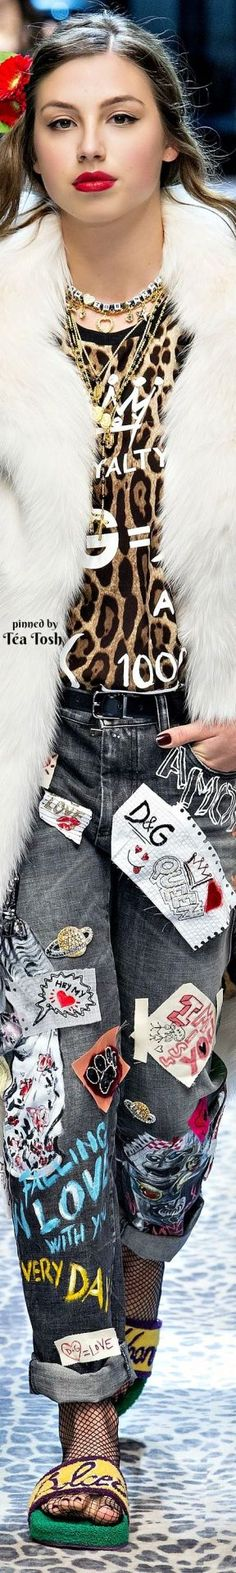 ❇Téa Tosh❇ Dolce & Gabbana, Fall 2017, Ready-to-Wear Collection